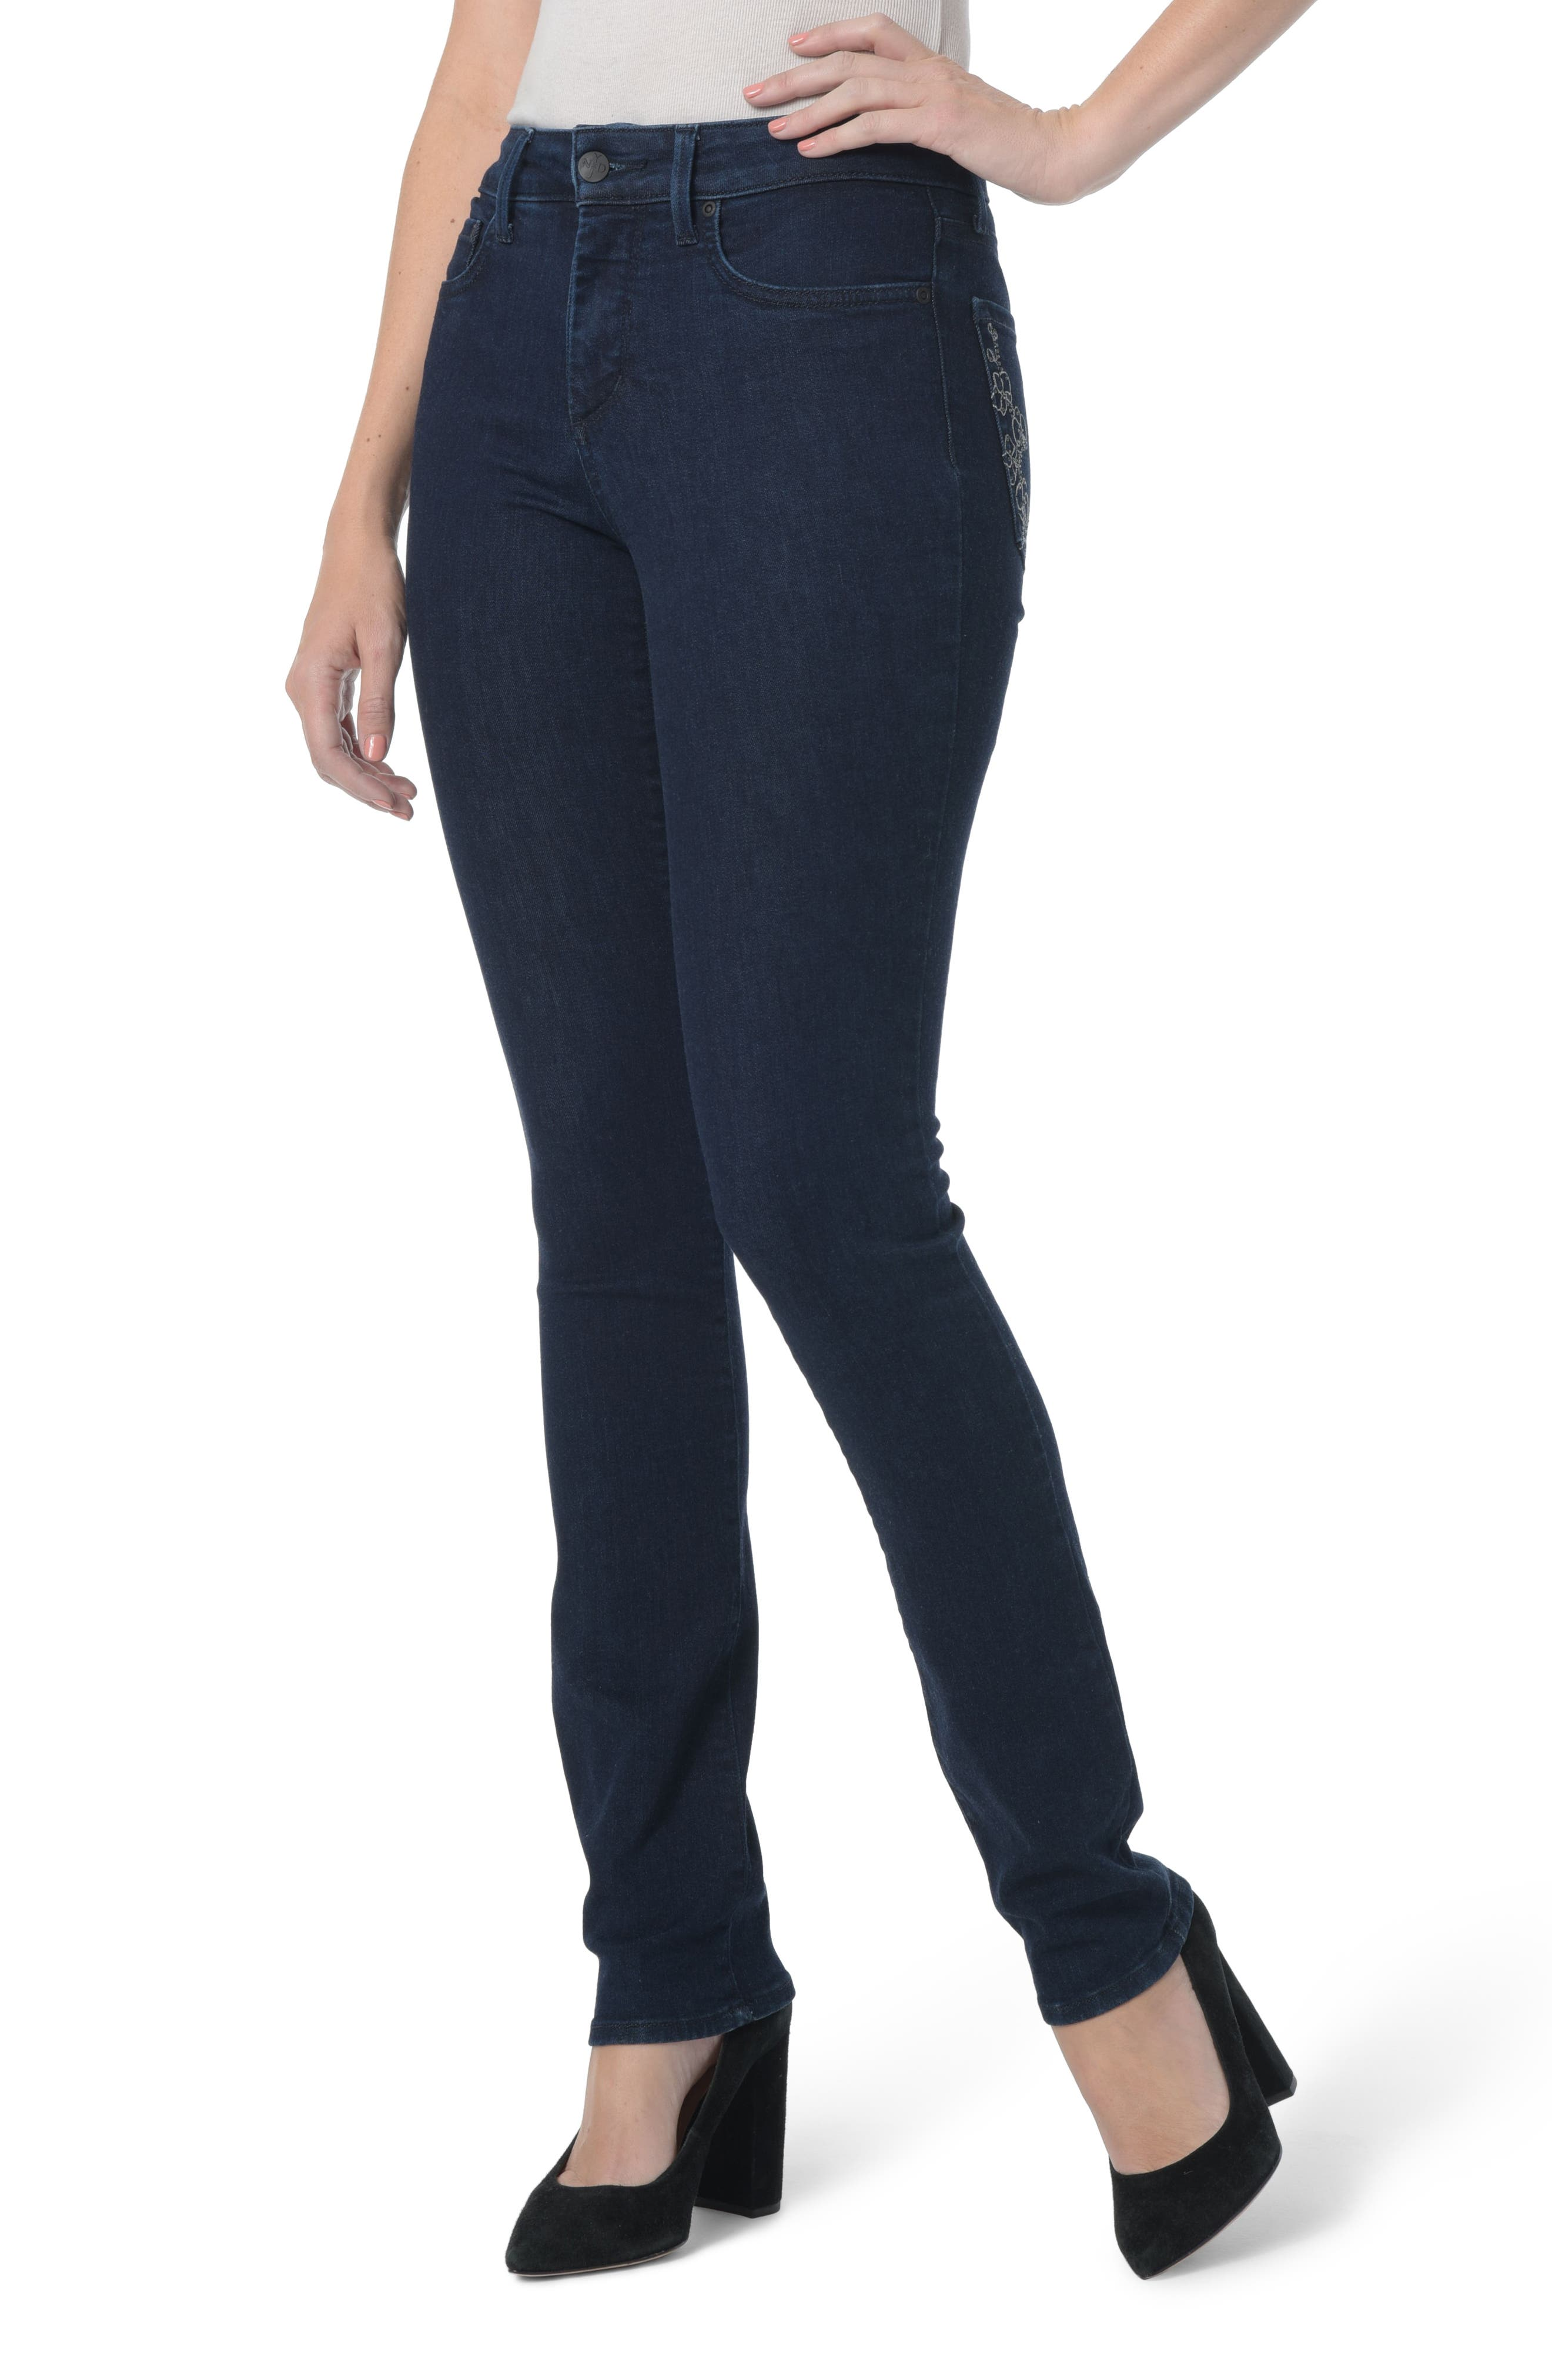 NYDJ Sheri Floral Bling Stretch Slim Jeans (Rinse)